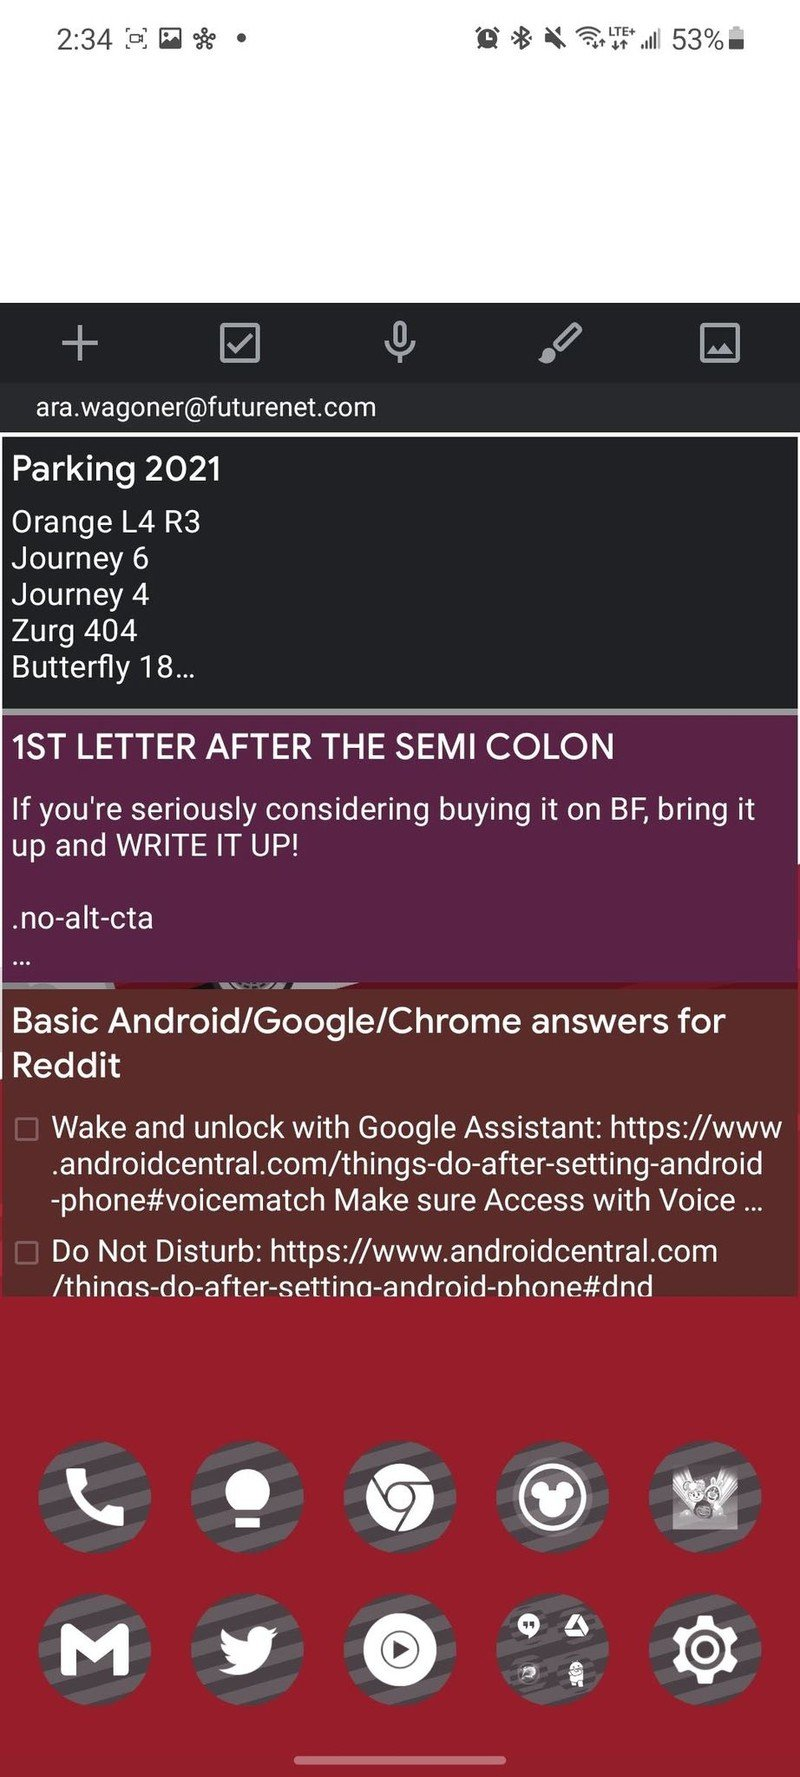 google-widgets-google-keep-colors.jpg